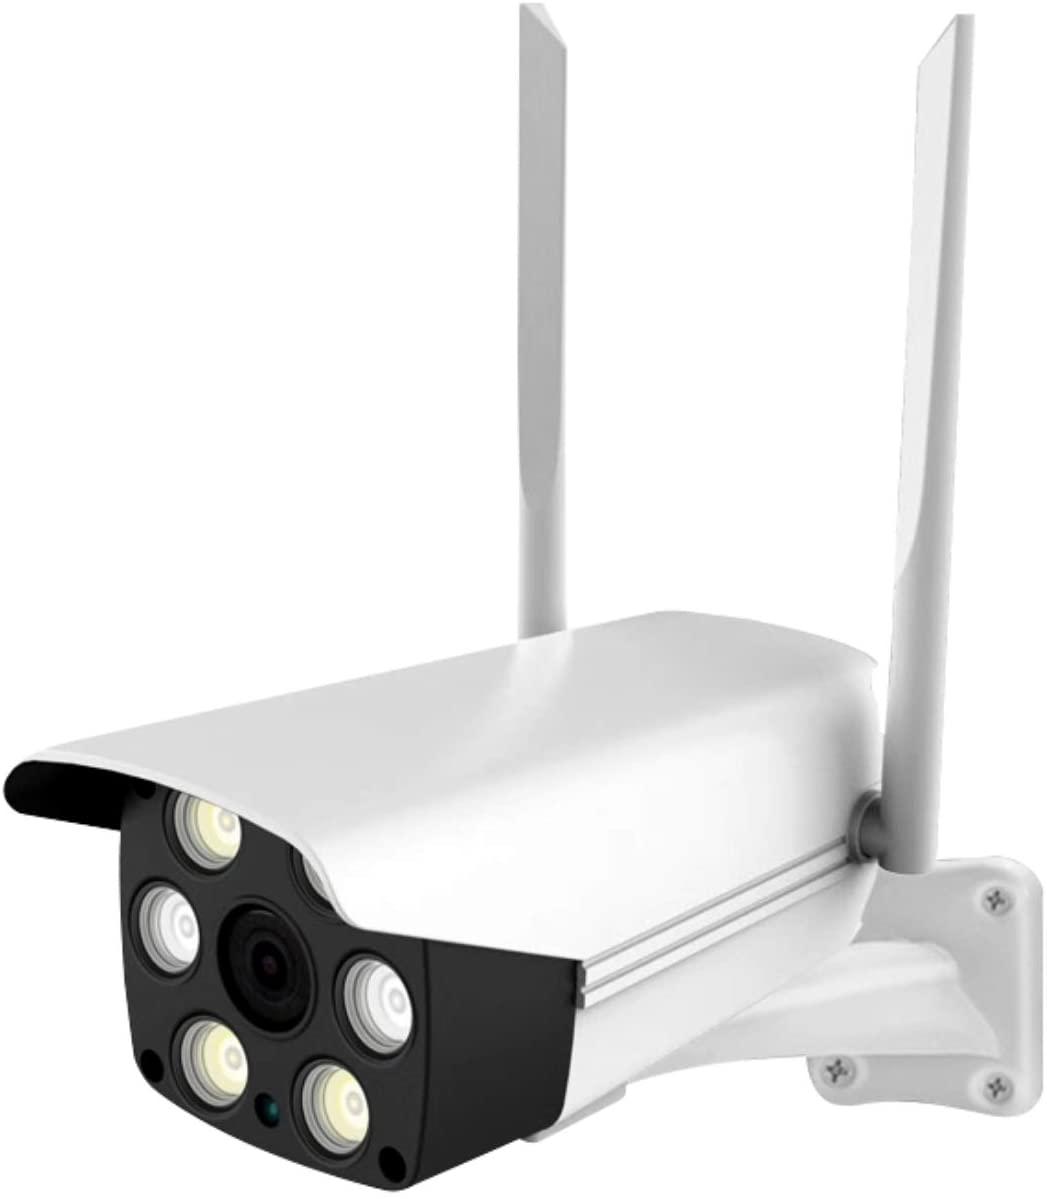 EVEREXCEED 홈 시큐리티 카메라 1080P HD 야외 와이파이 감시 카메라 스마트 IP 캠 야간 비전 | 모션 감지 | 클라우드 | 마이크로 SD 녹음 | 2.4GHZ WIFI | 네트워크 인터페이스 | 배터리 없음